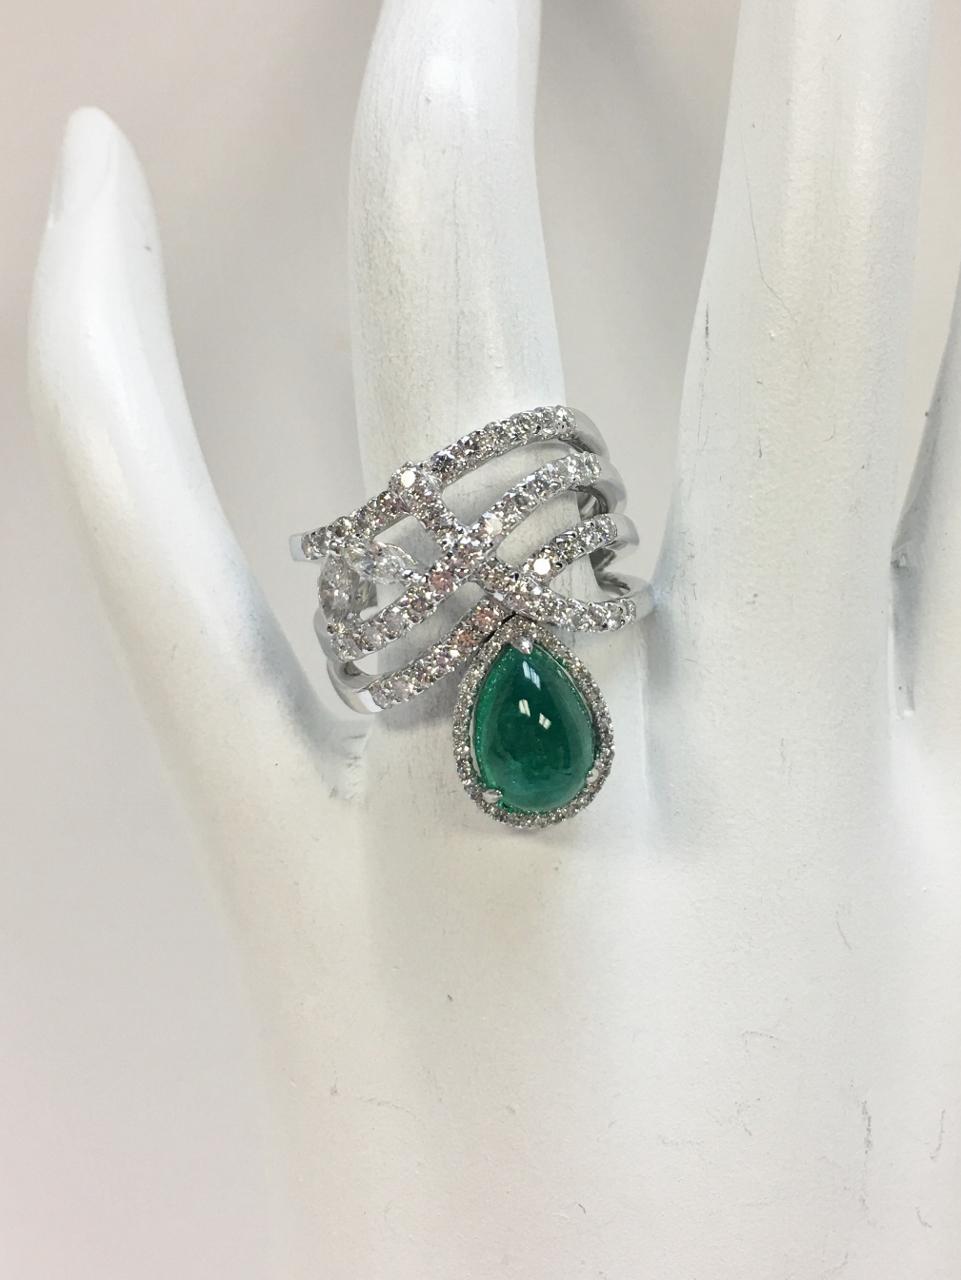 2.40 Carats Cabochon Emerald & Diamond Ring